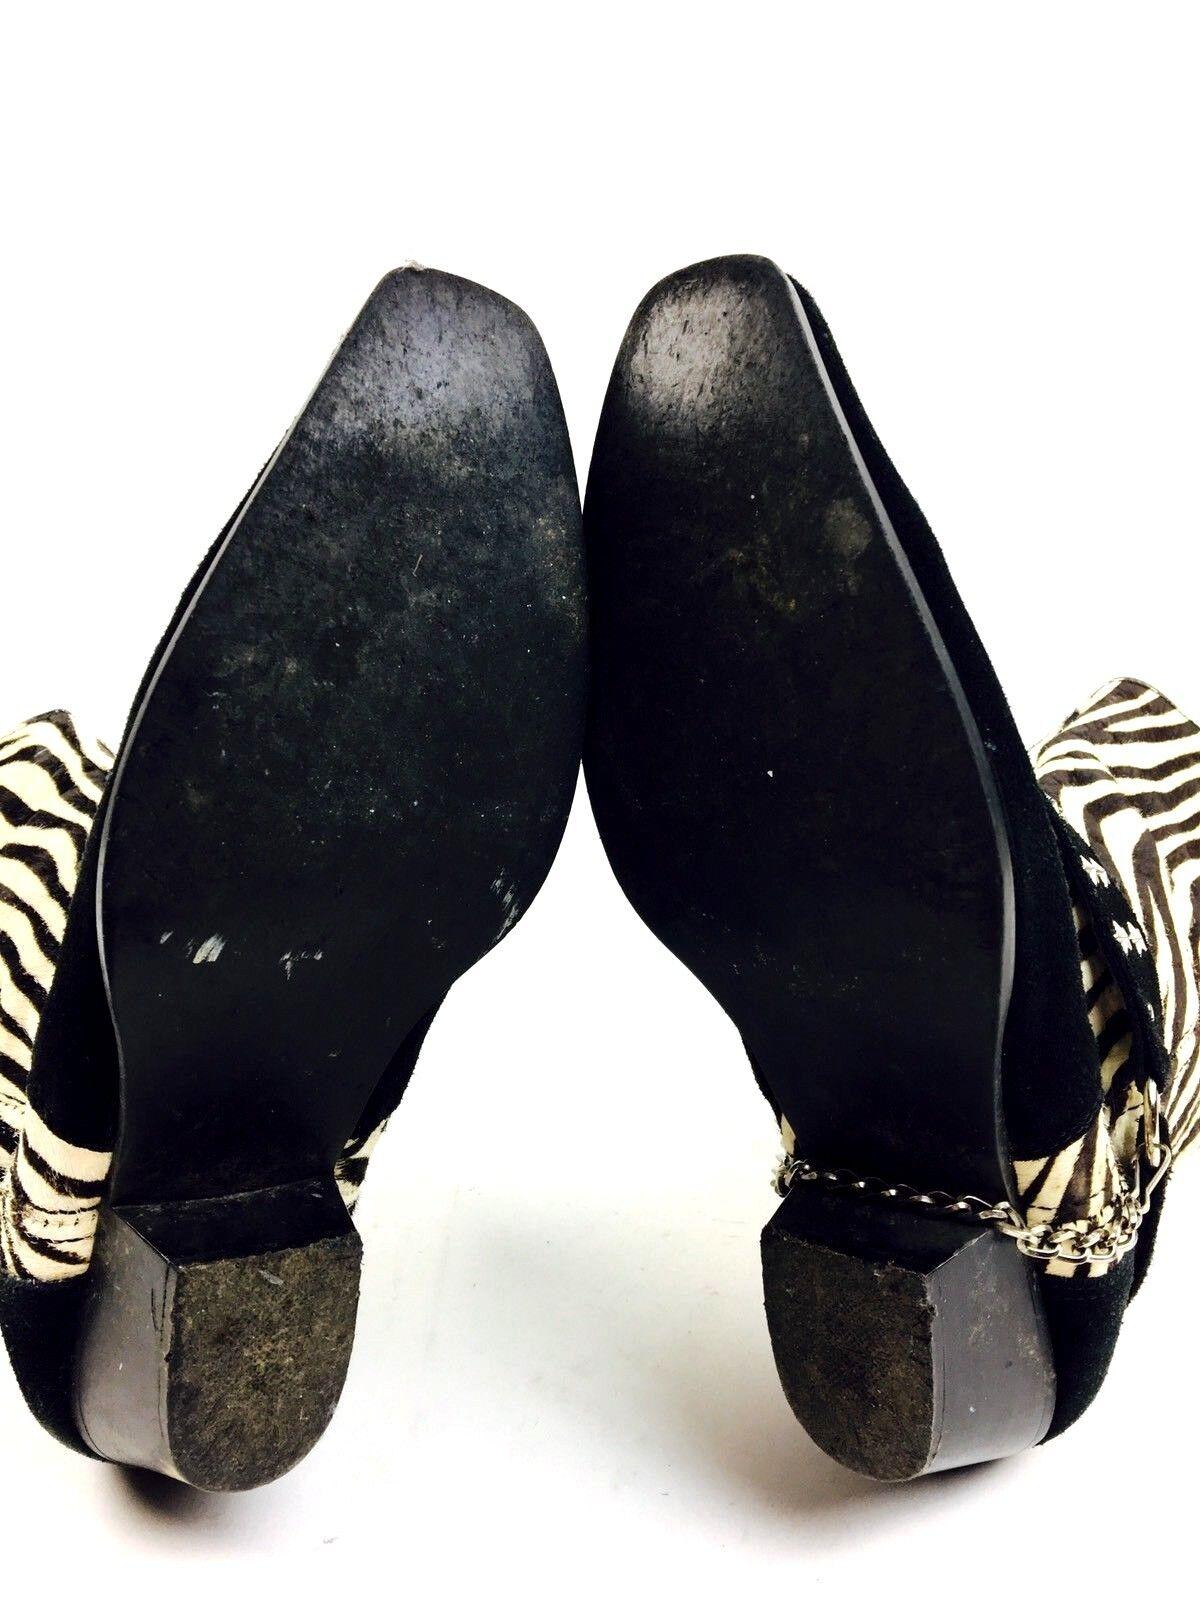 Zebra Cowboy Boots Women's Shoes Women's Boots He… - image 7